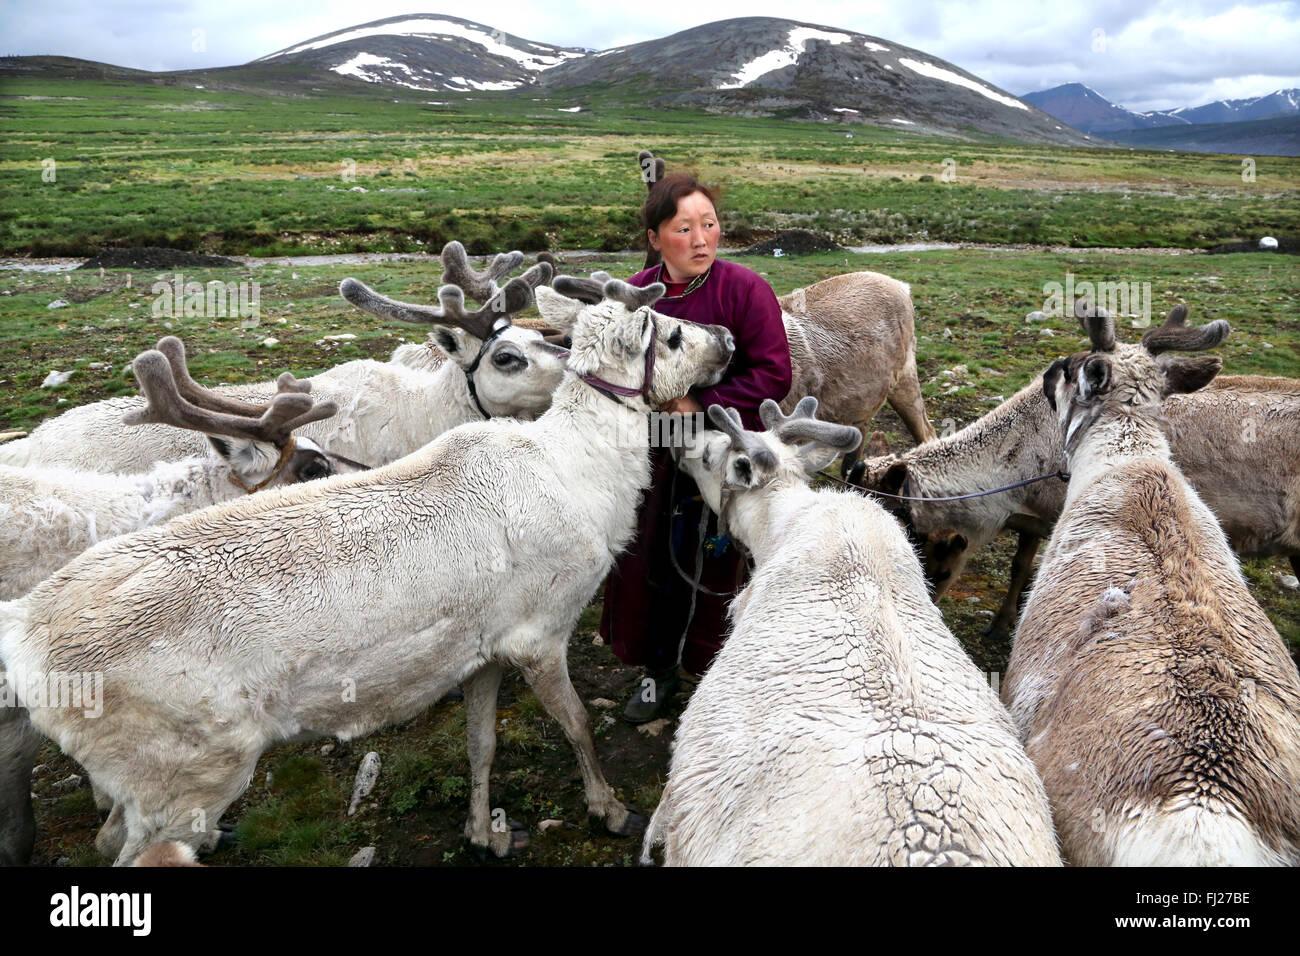 Woman with reindeer, , Tsaatan Dukha people , nomadic reindeer herders , Mongolia - Stock Image